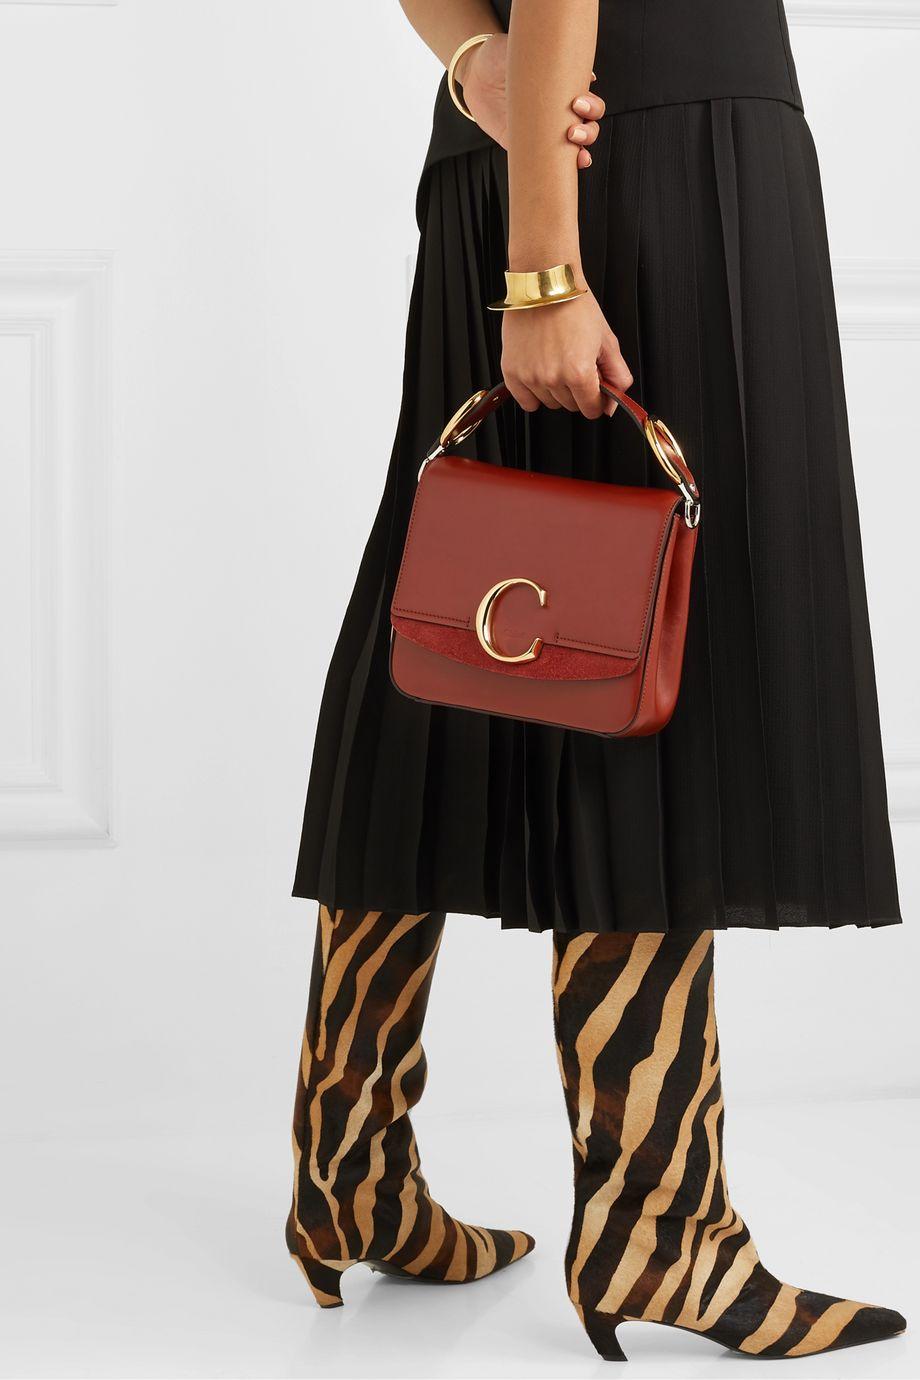 Chloé Chloé C small suede-trimmed leather shoulder bag